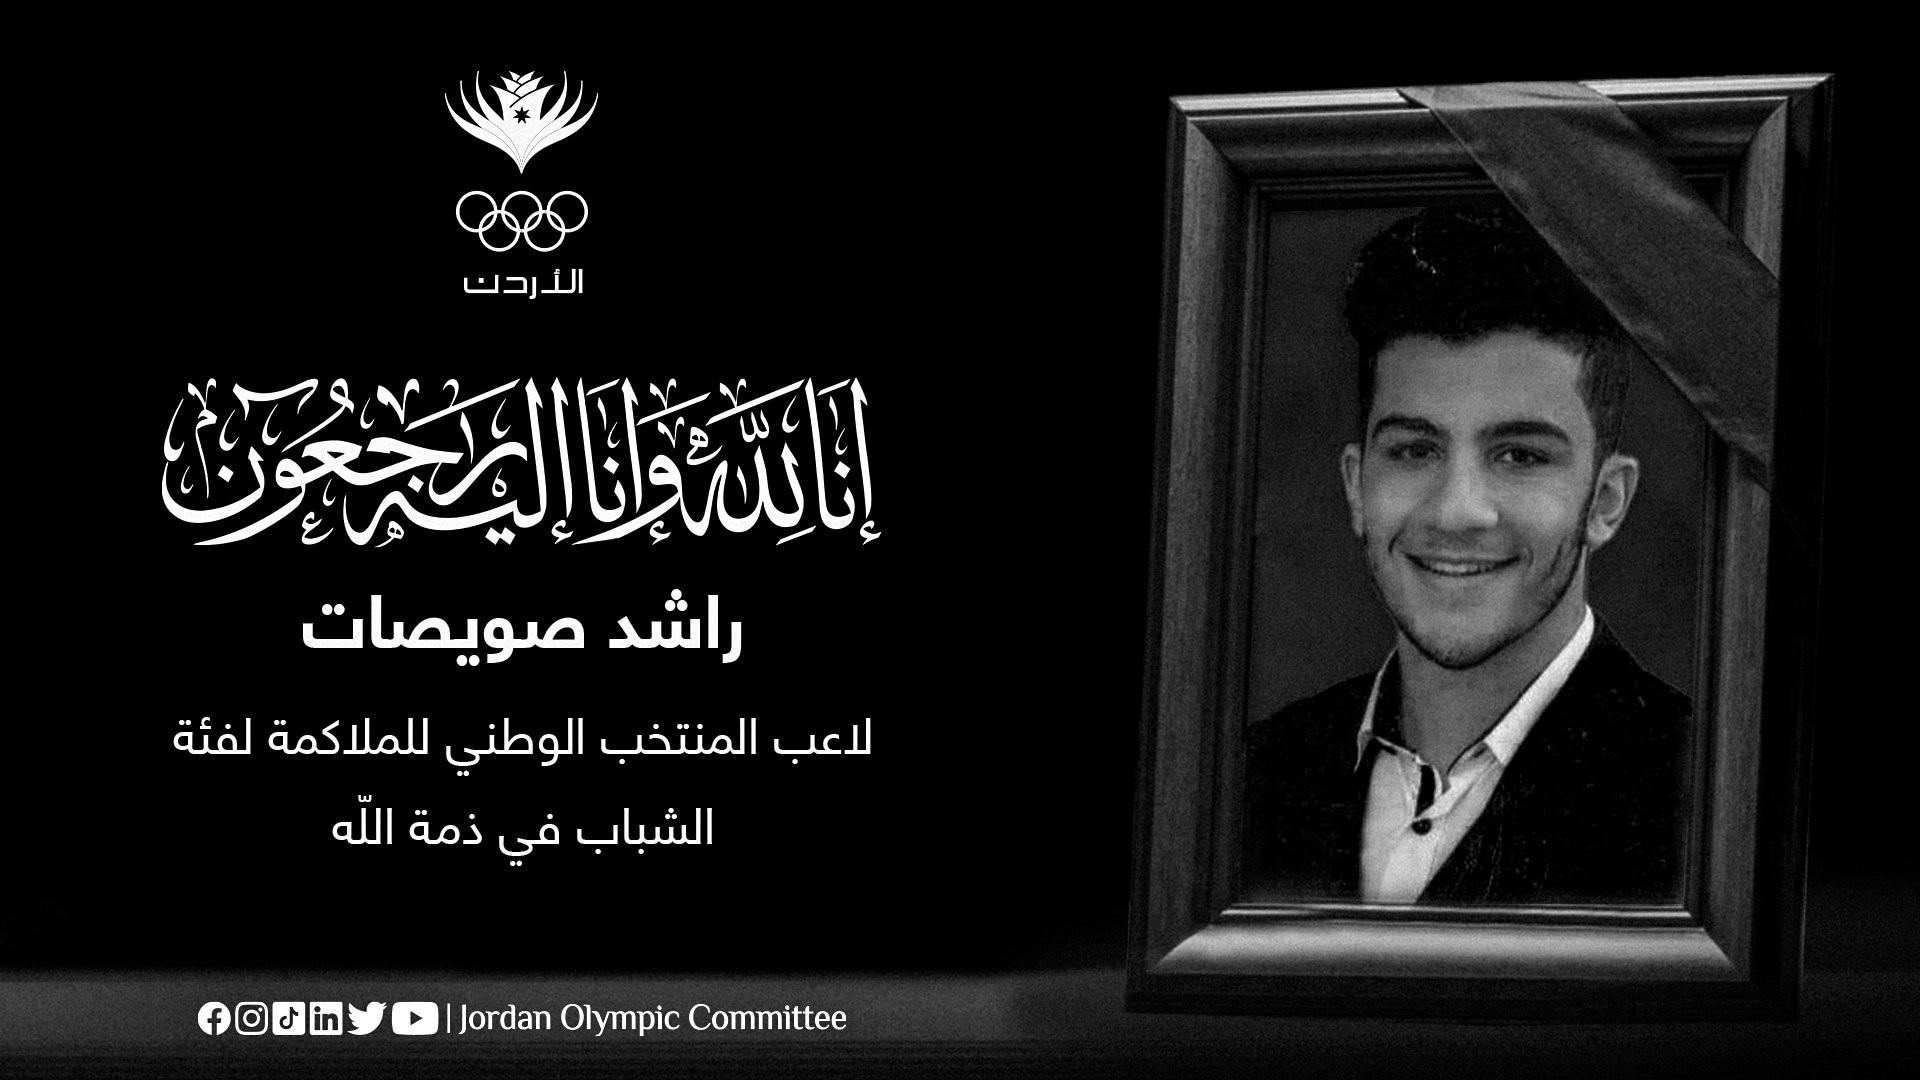 Jordan boxer Al-Swaisat dies following serious injury at AIBA Youth World Boxing Championships